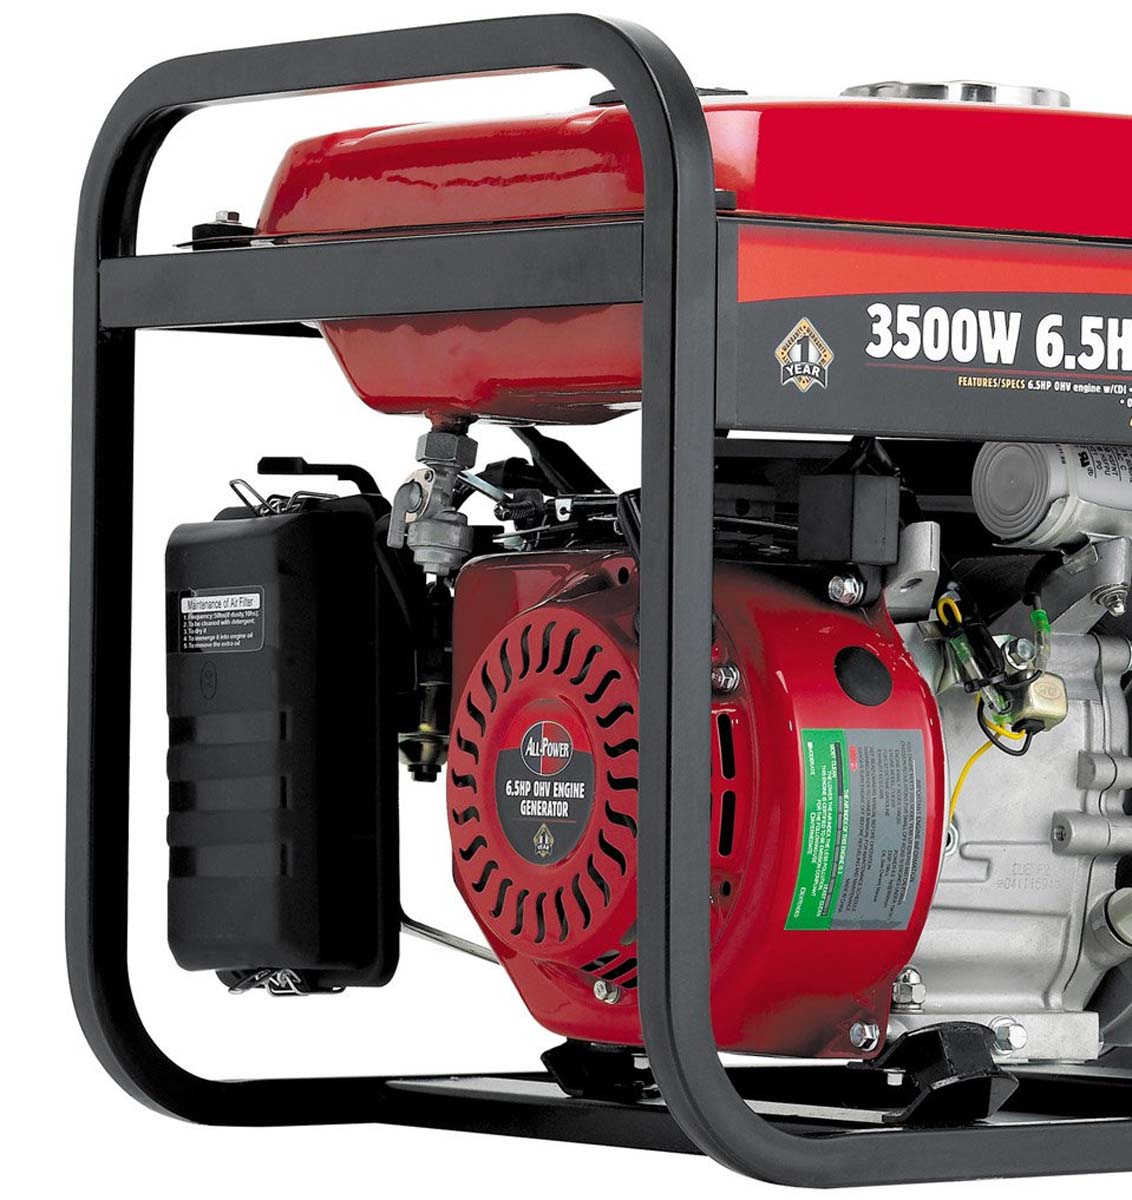 Allpower 3500W Portable Generator Deluxe Side Panel, APG3001   Walmart.com